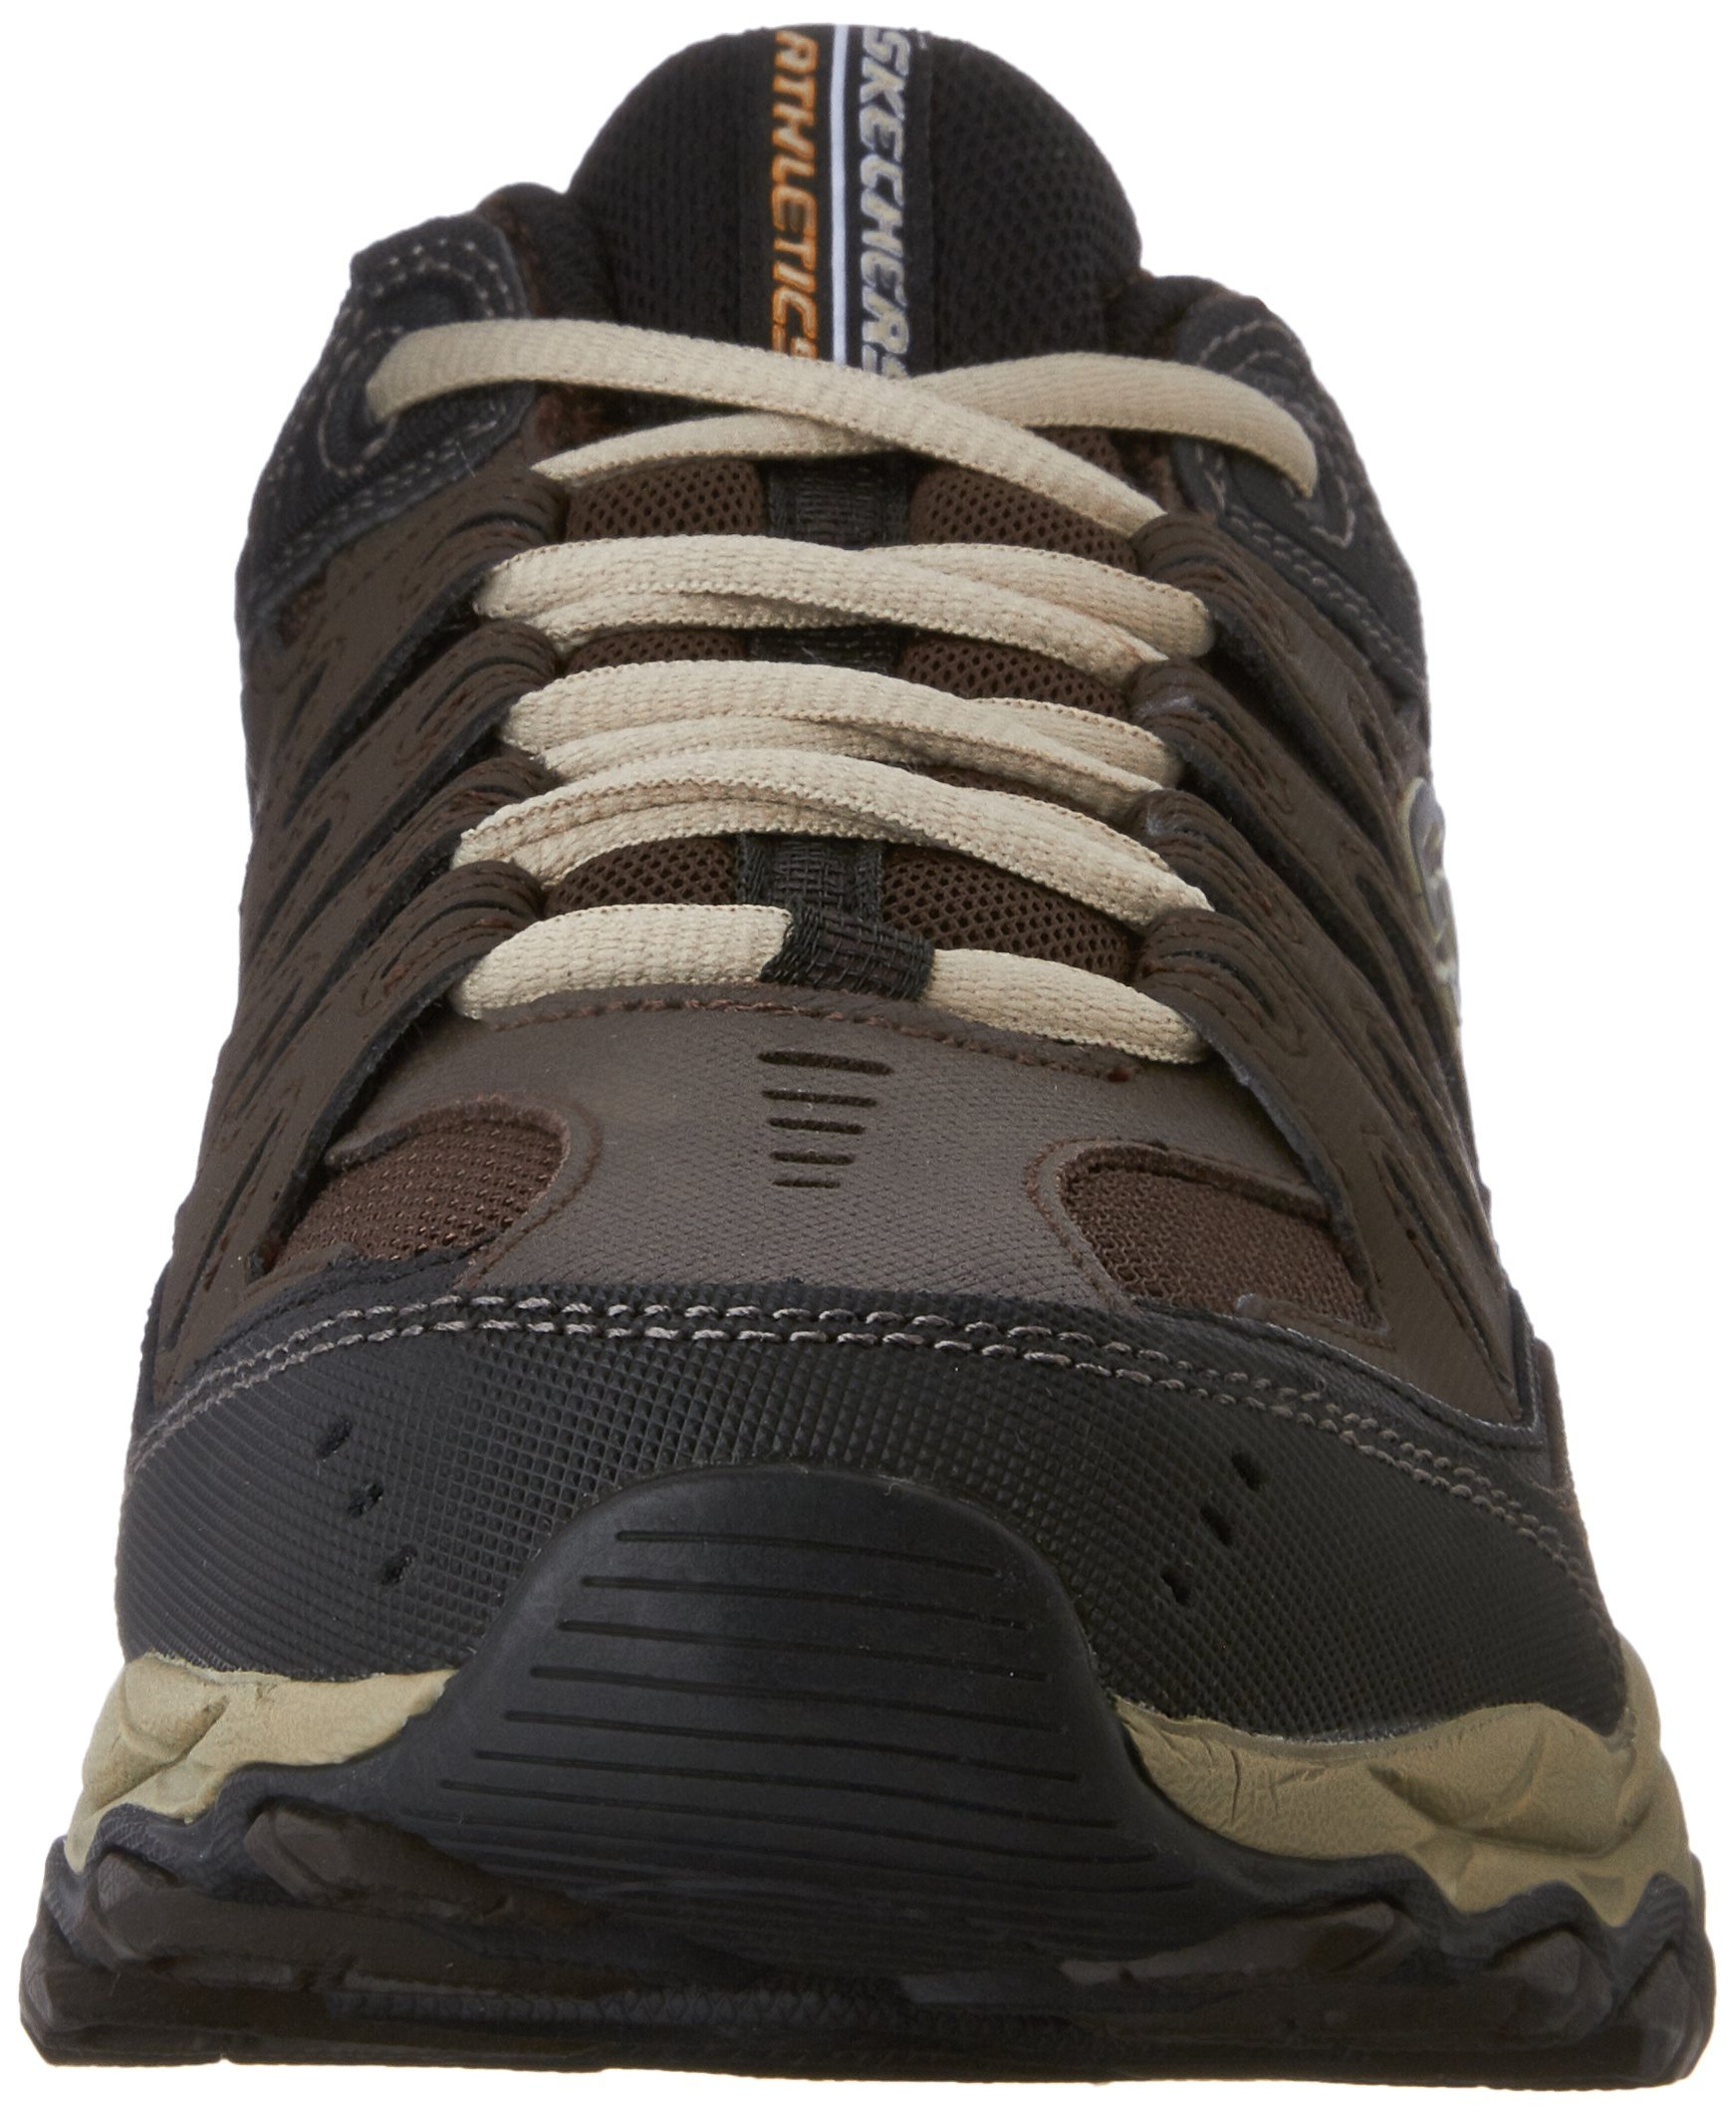 Skechers Men's AFTERBURNM.FIT Memory Foam Lace-Up Sneaker, Brown/Taupe, 7 M US by Skechers (Image #4)